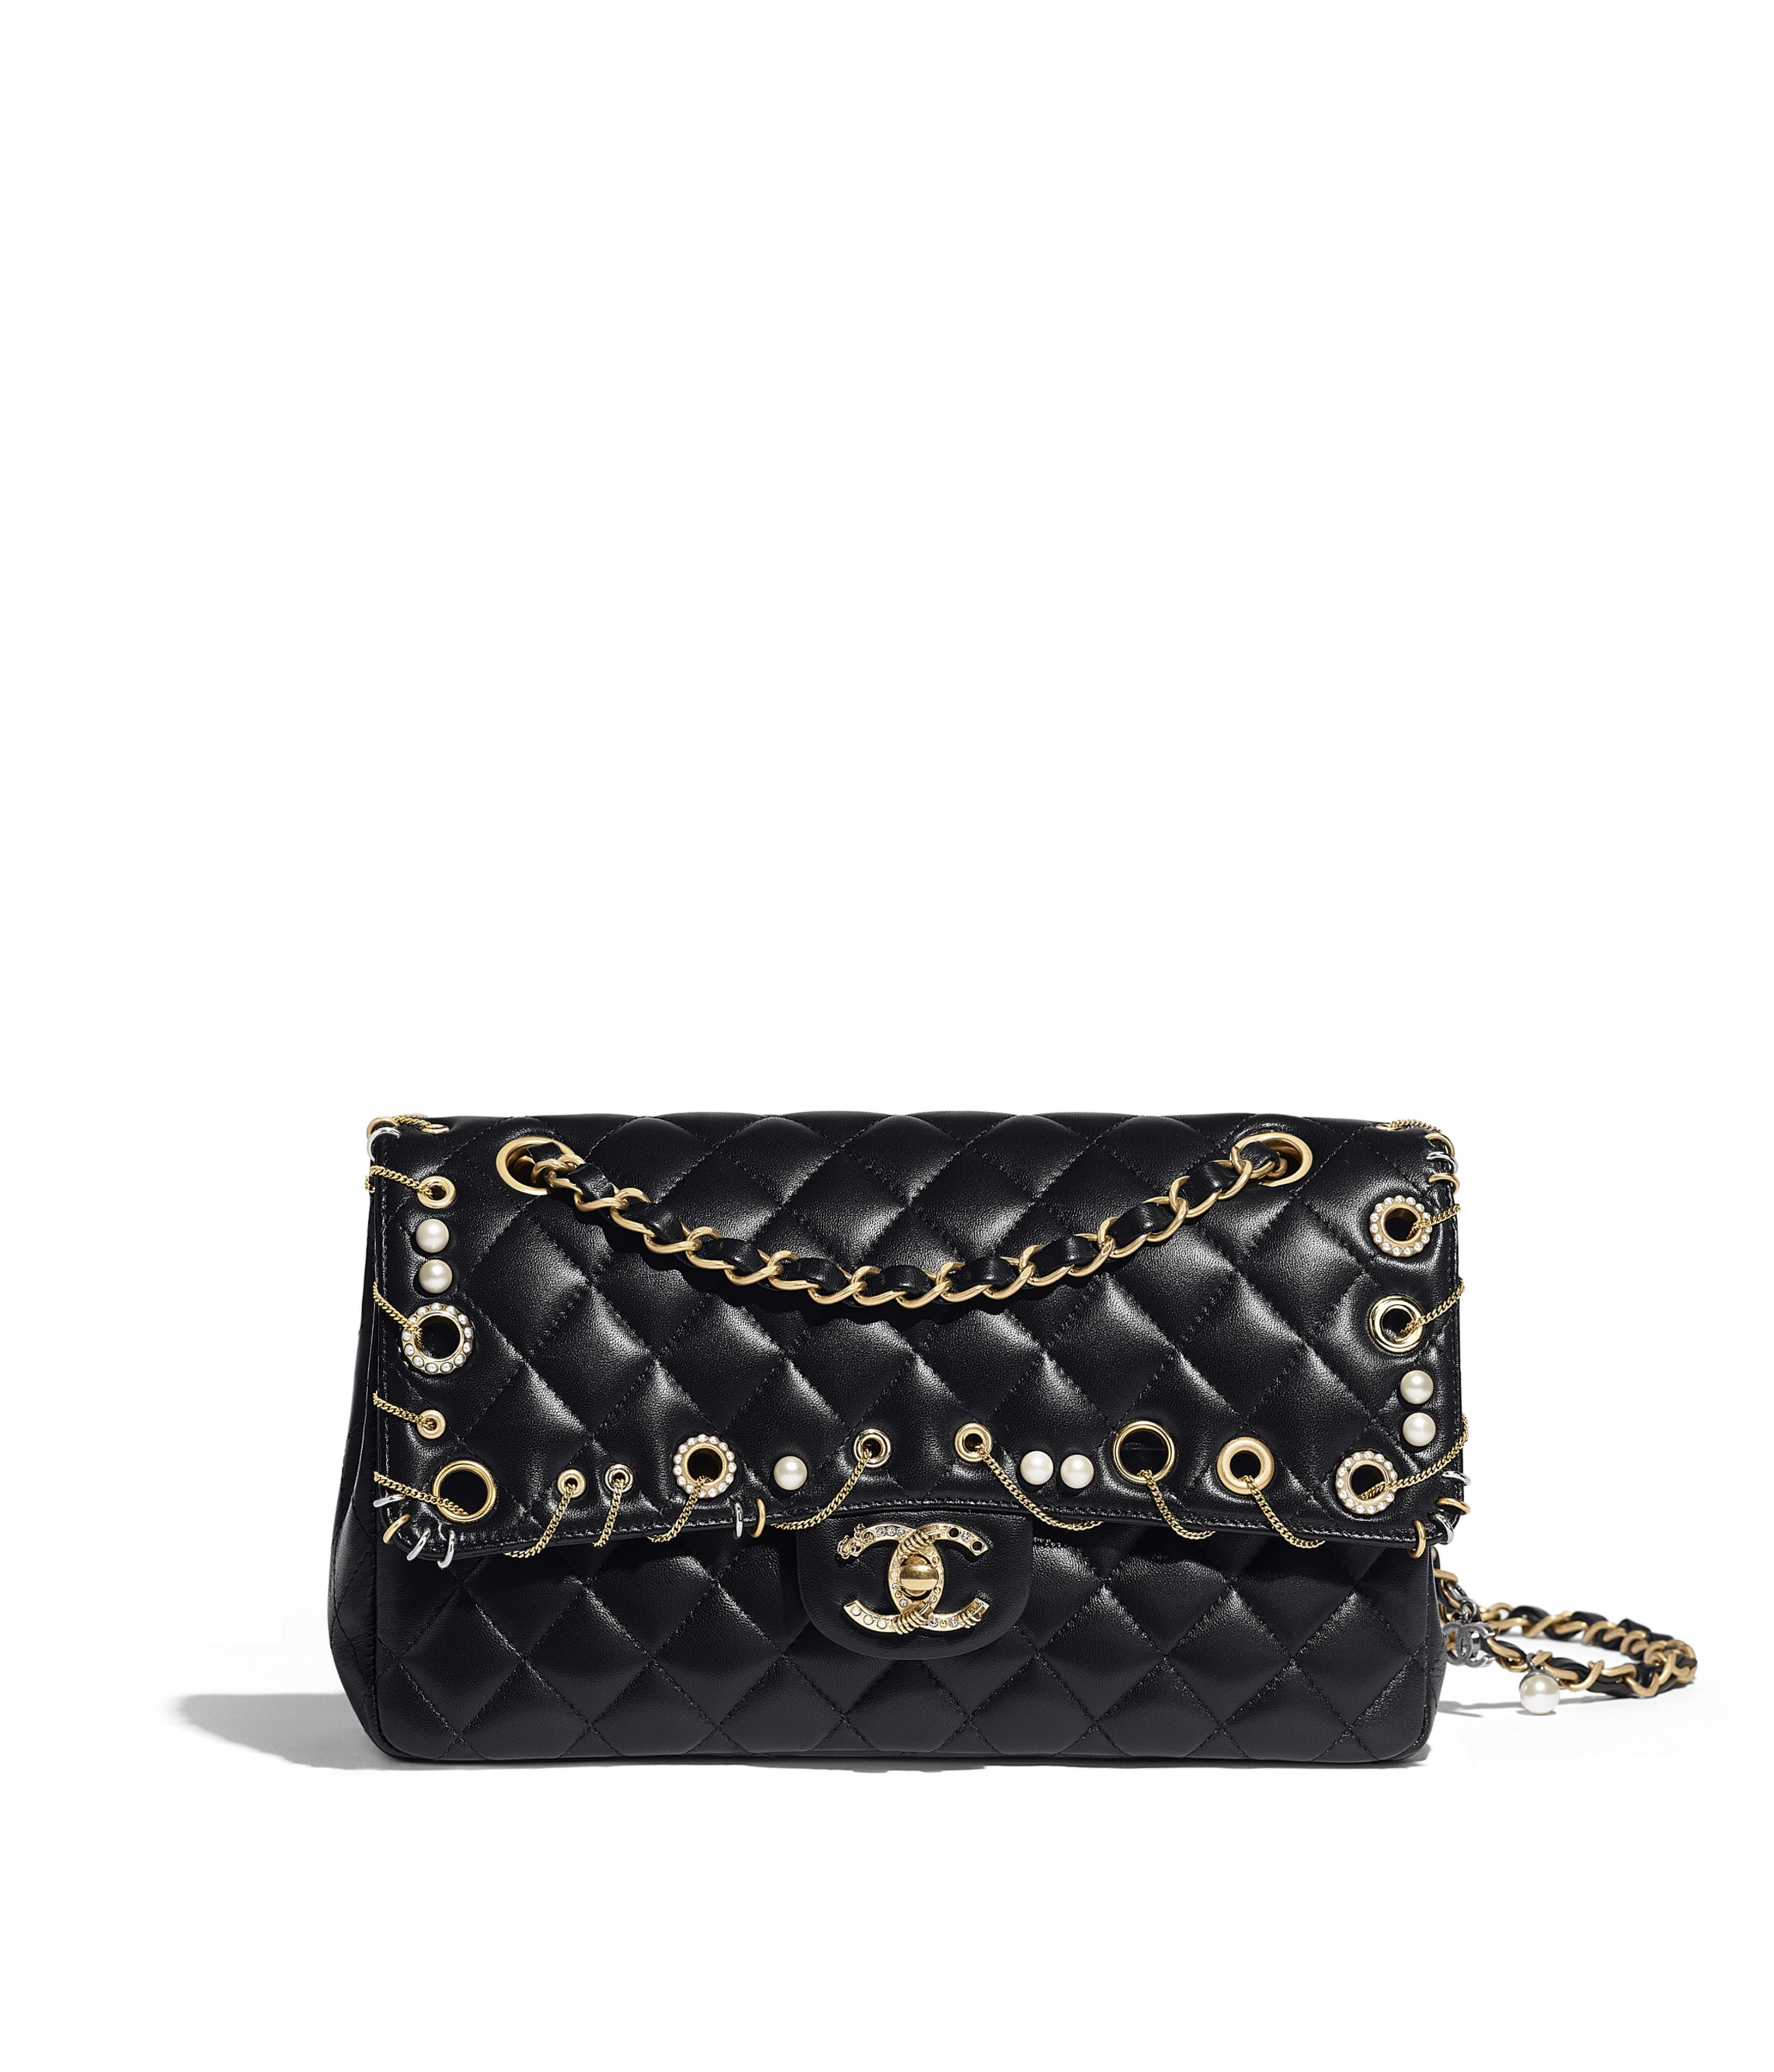 caf2209b55 Classic Handbag Lambskin